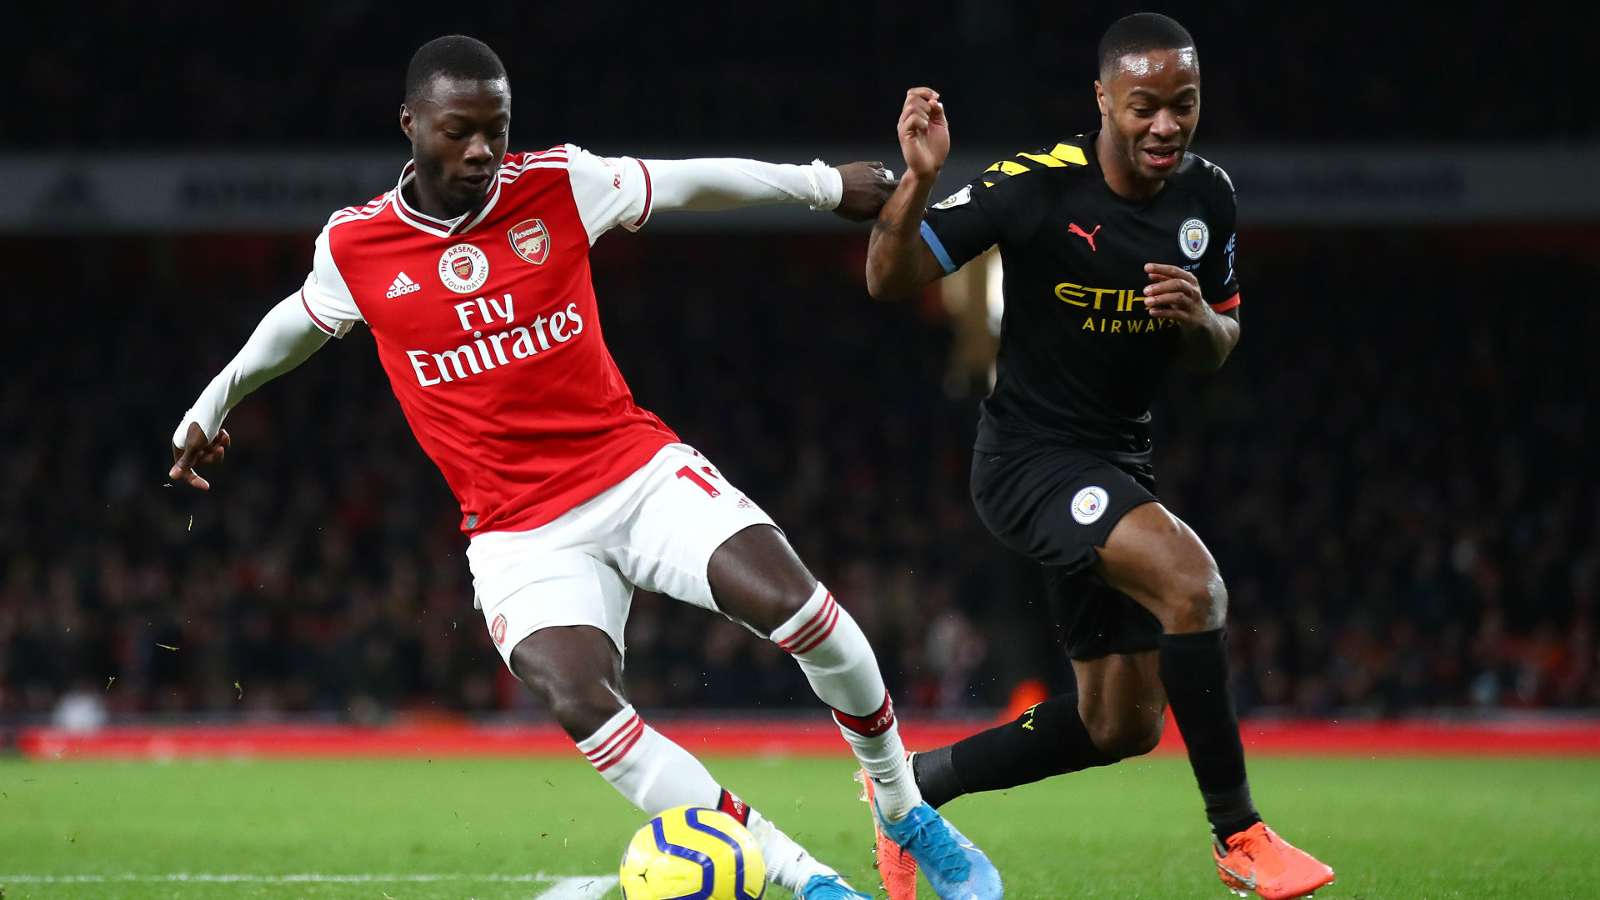 Nicolas Pepe Raheem Sterling Arsenal Manchester City 2019-20